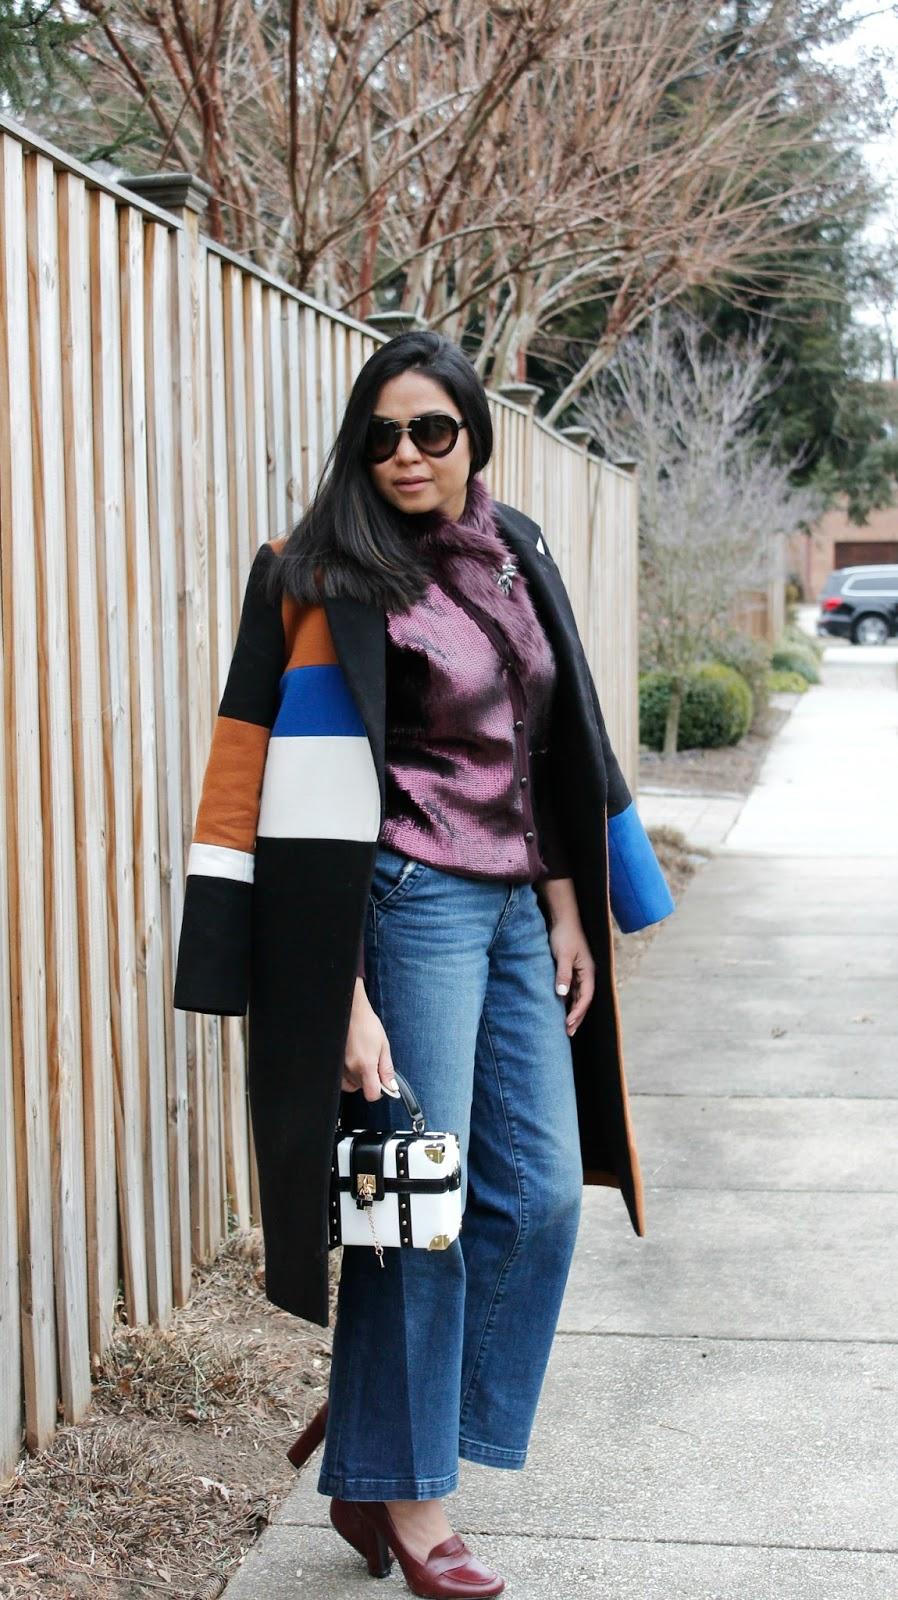 Shop bop color block coat, gap wide leg denim, sequin cardigan with fur, loafers